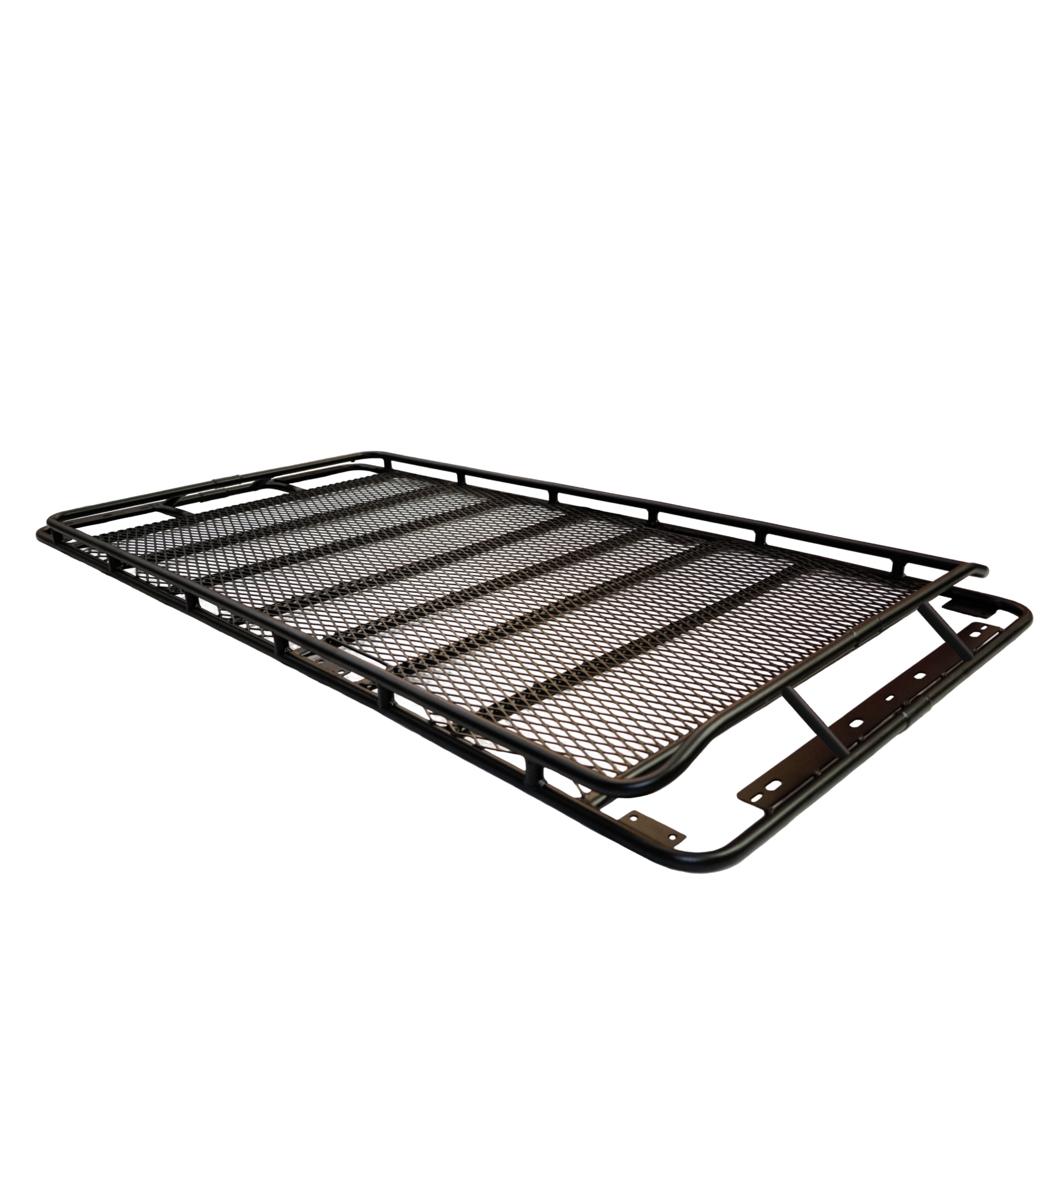 Ladder Roof Rack >> TOYOTA 4RUNNER 5th GEN · STEALTH RACK· 4 Independent LED Lights · NO SUNROOF - Gobi Racks